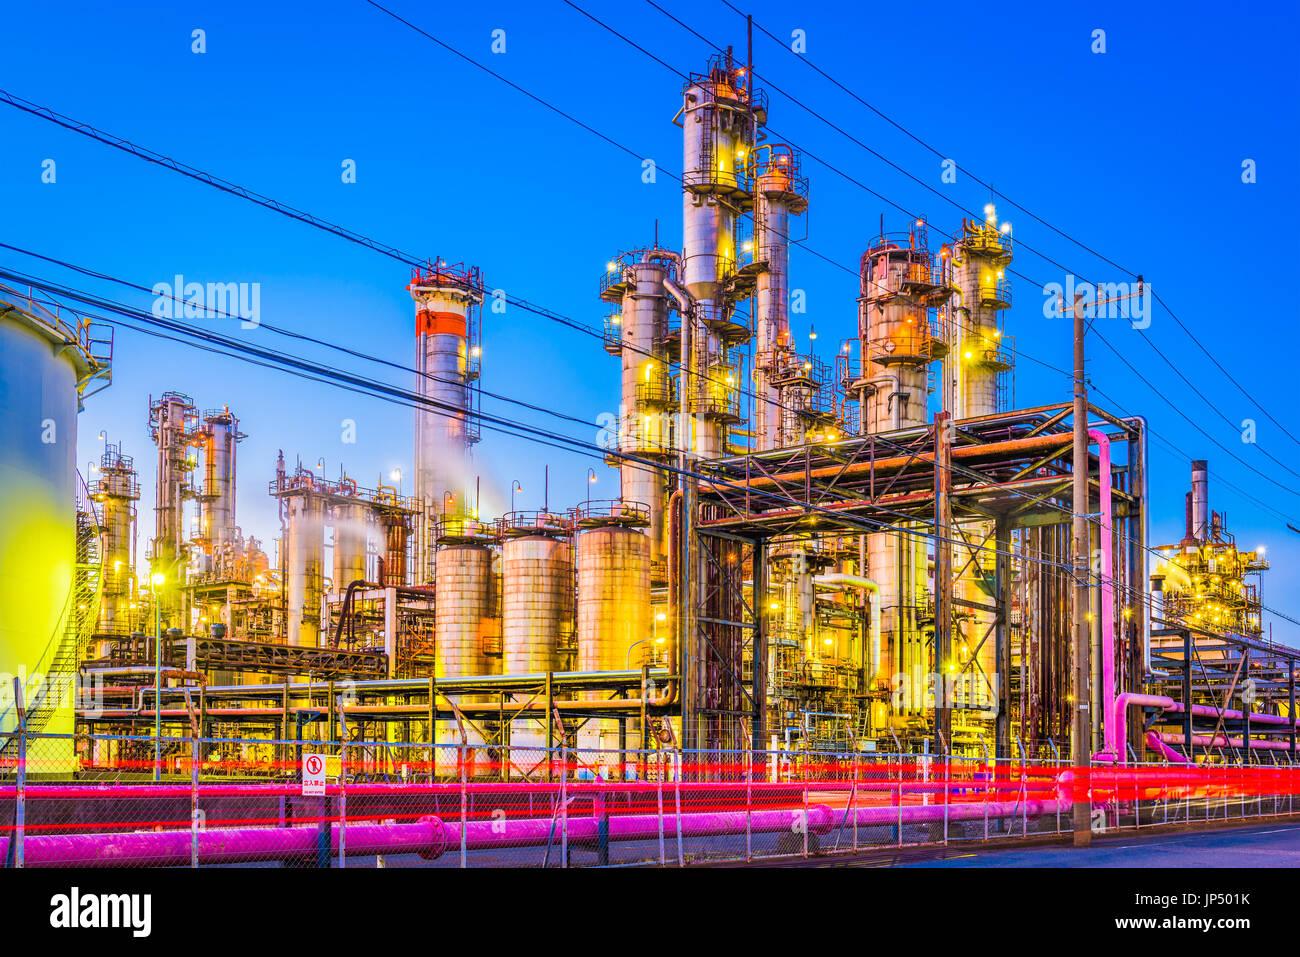 factories-at-twilight-in-japan-JP501K.jp